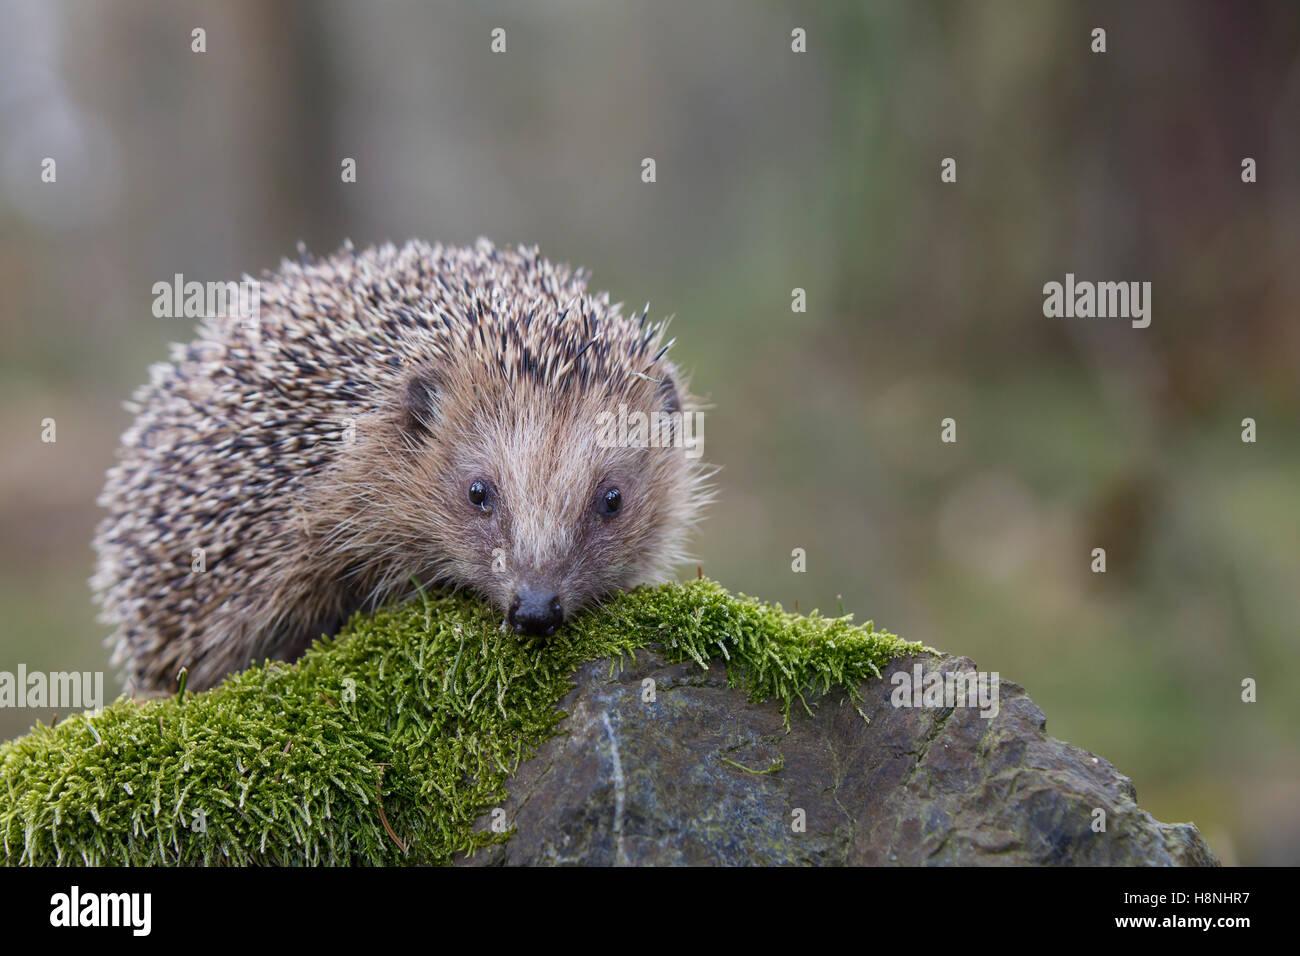 Igel, Erinaceus europaeus, Hedgehog - Stock Image